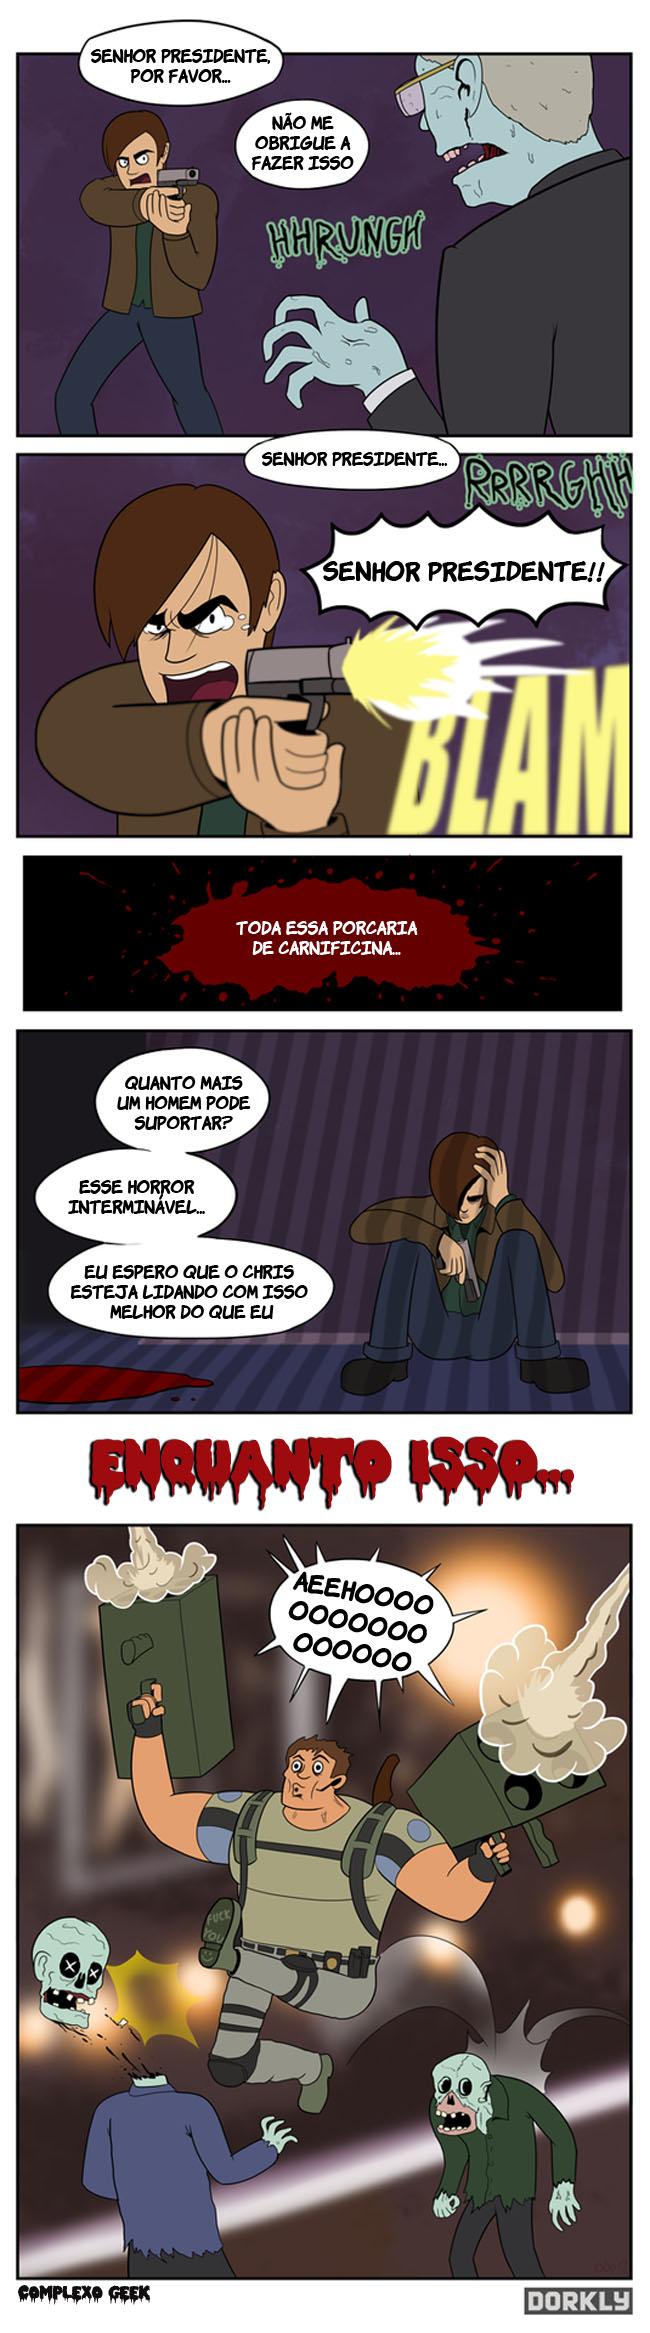 0 Resadent Evil 6